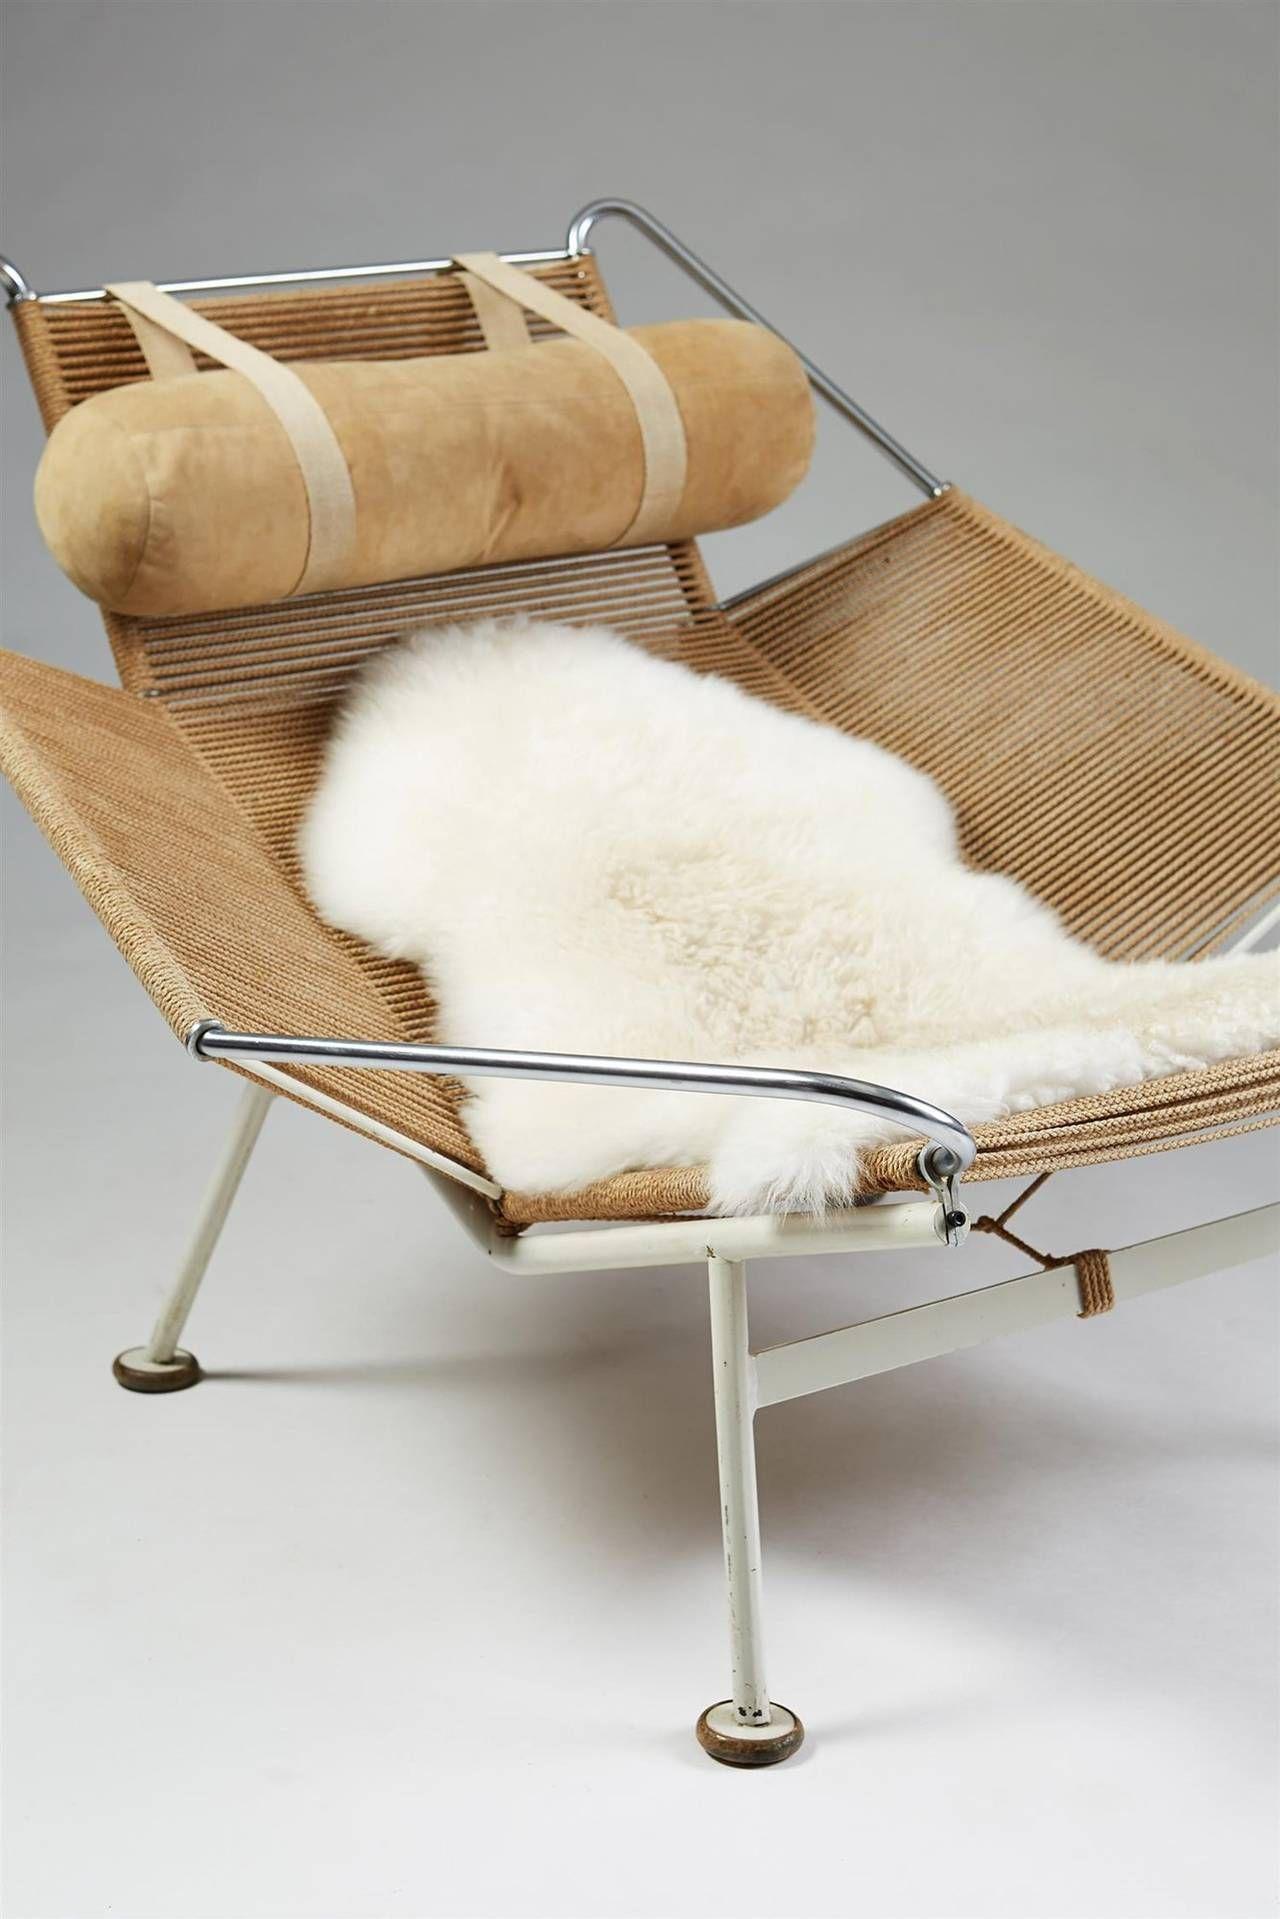 Flag Halyard Chair Designed By Hans Wegner For Getama Denmark 1950 Image 5 Lounge Chair Design Chair Design Furniture Chair